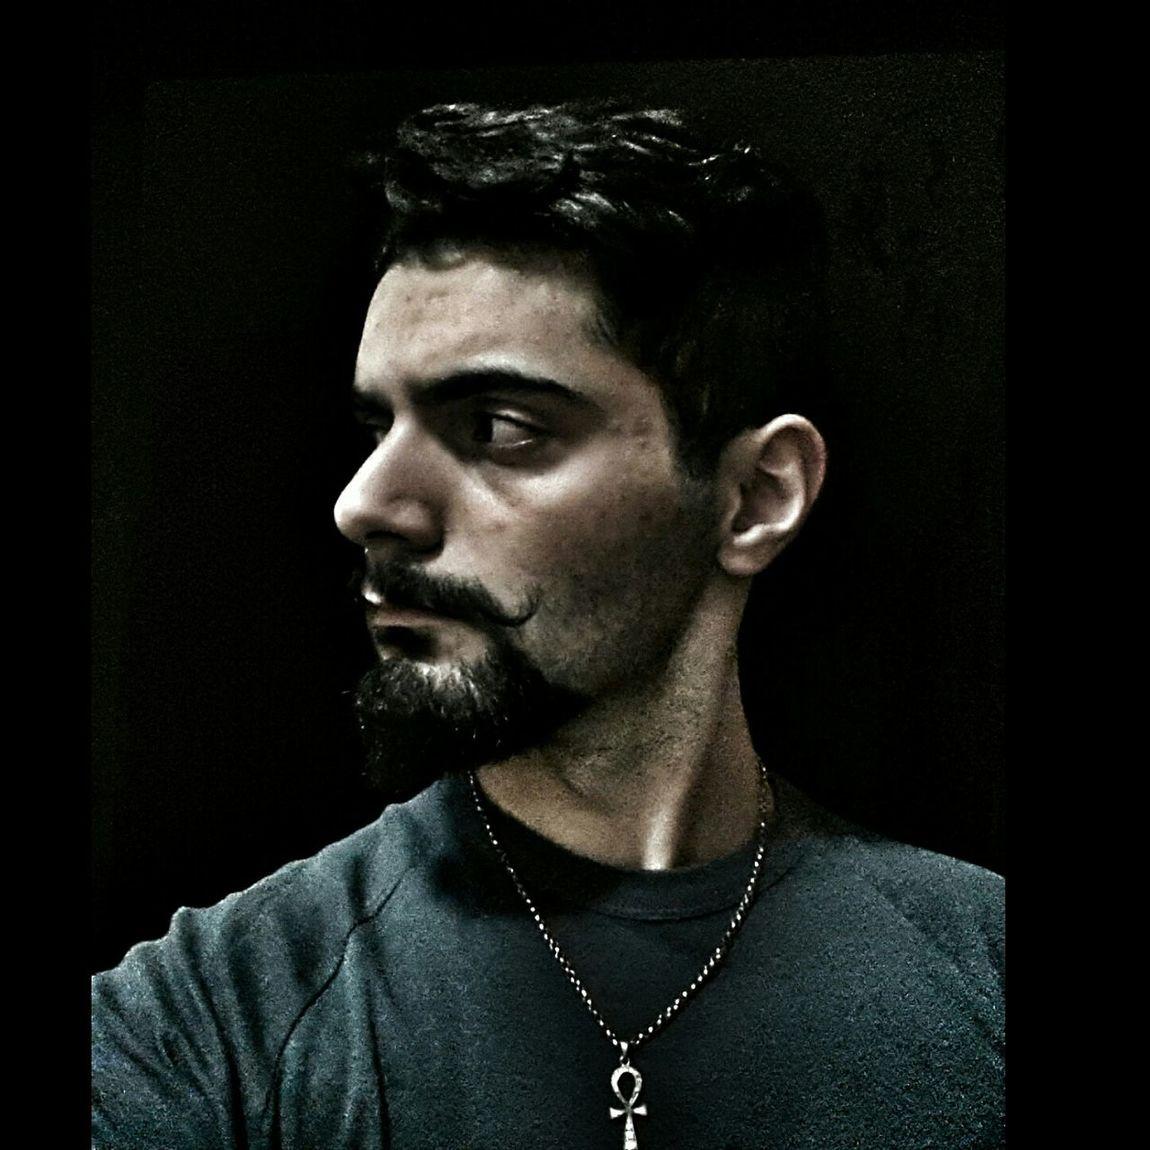 Dark Beard Face Photography Horror Angry Mr.Semiz Photography Horror Edition Bad ıstanbul